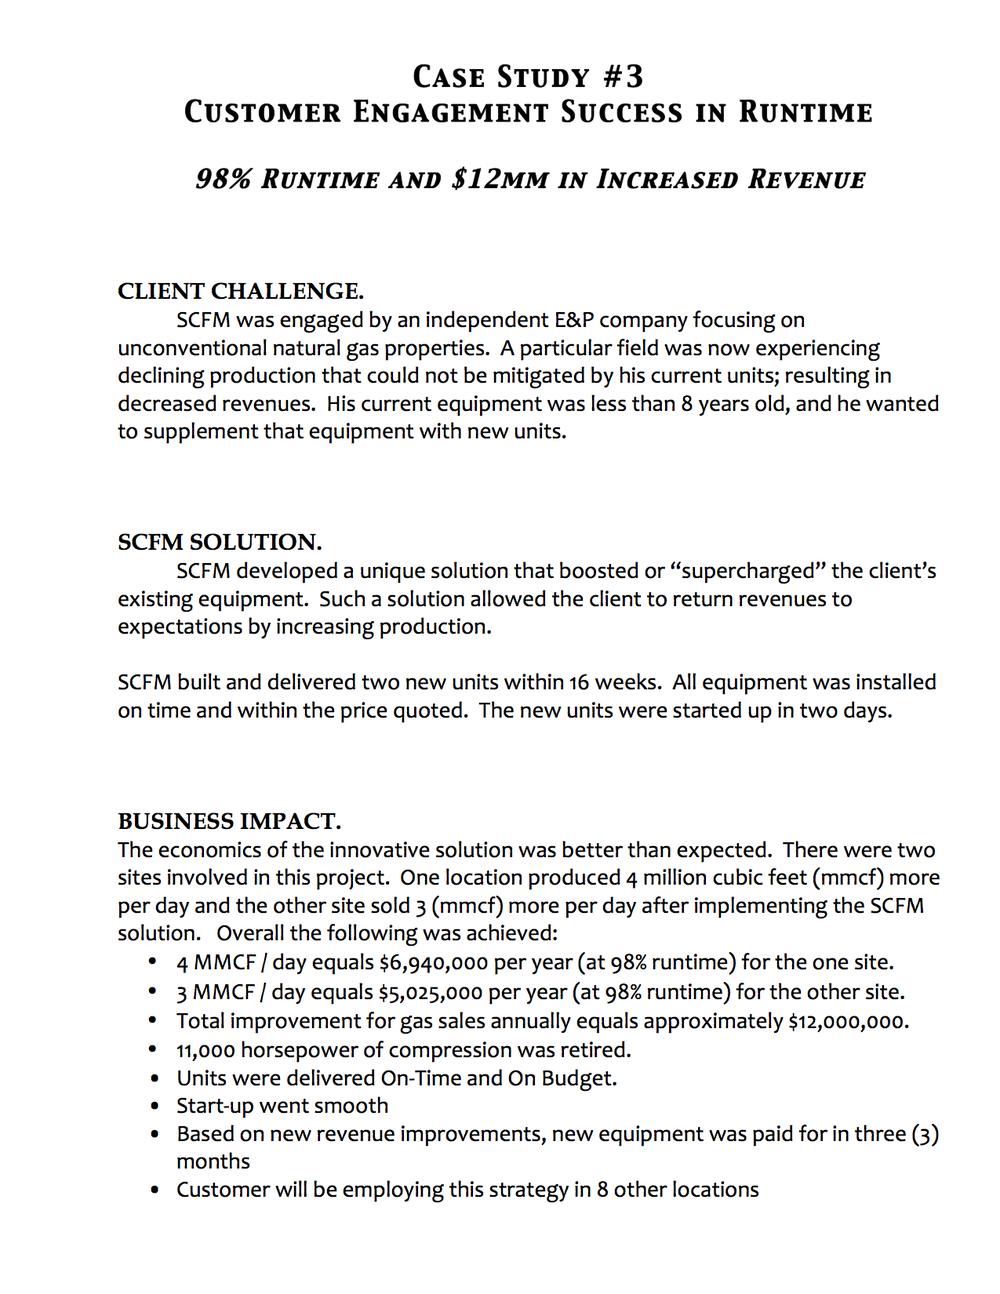 Case Study #3 - Customer Engagement Success Runtime.jpg